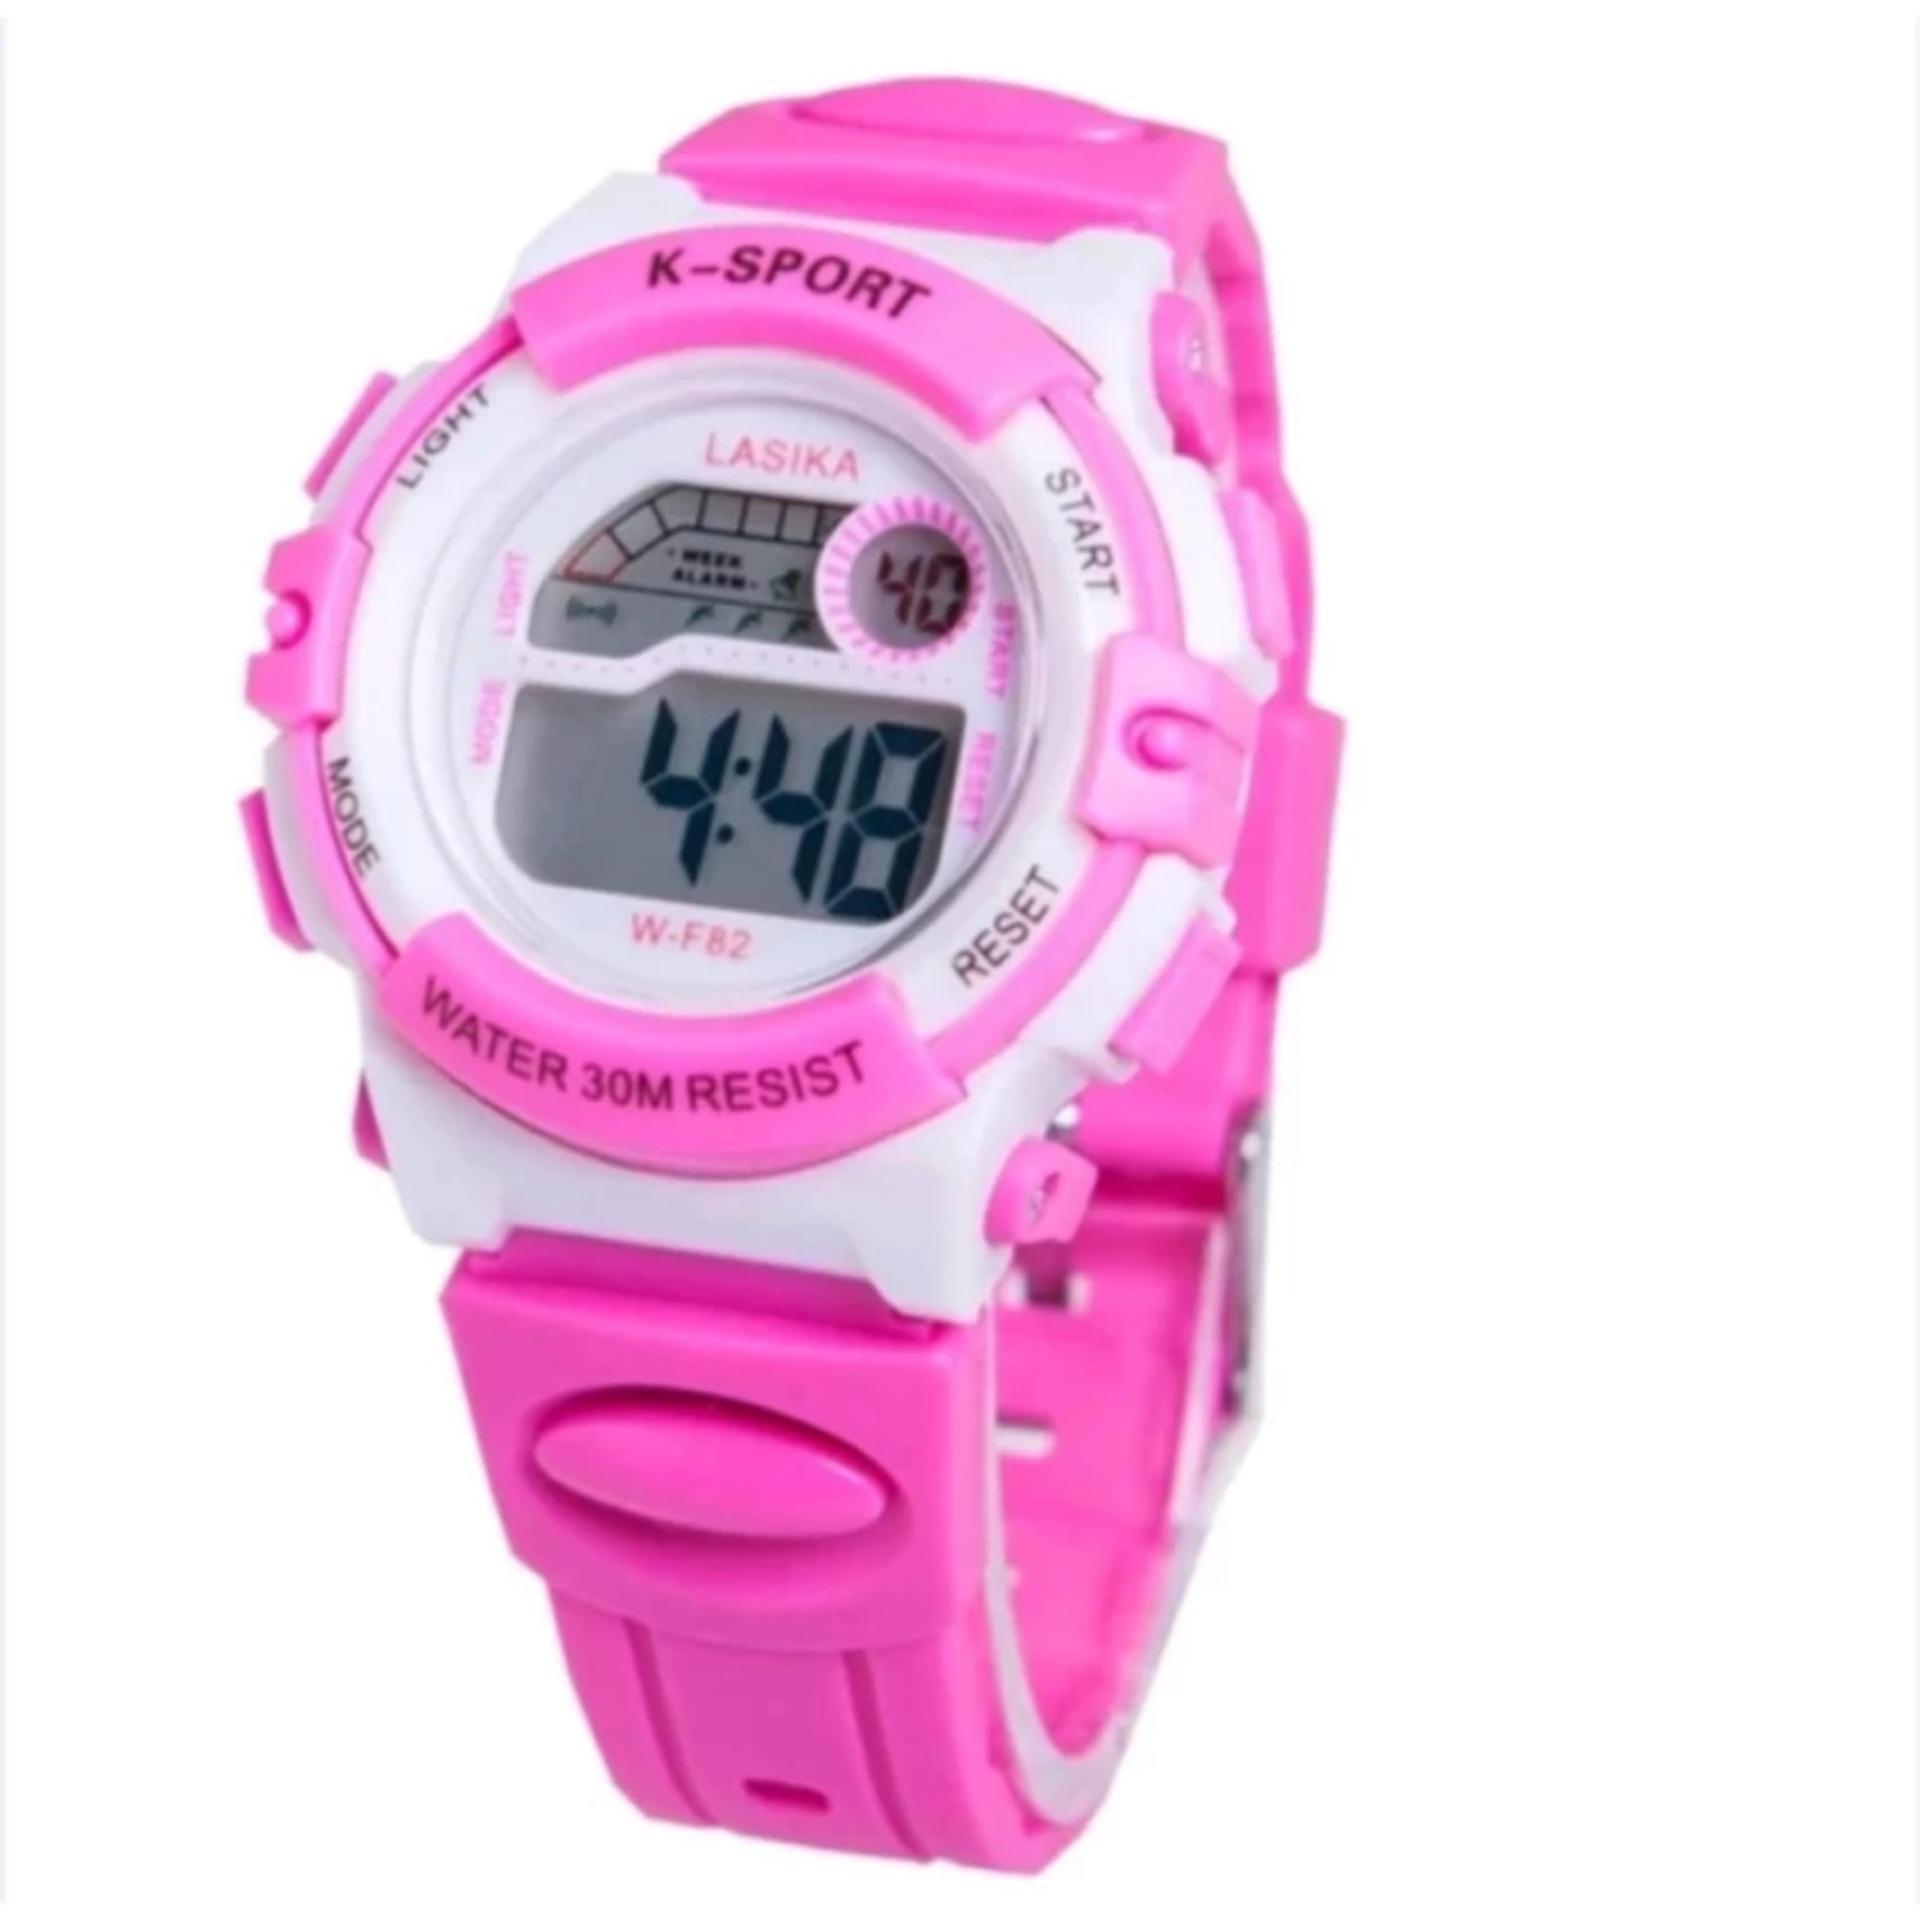 Jam Tangan Anak Lasika Unisex - Rubber Strap - Pink - W F82MR